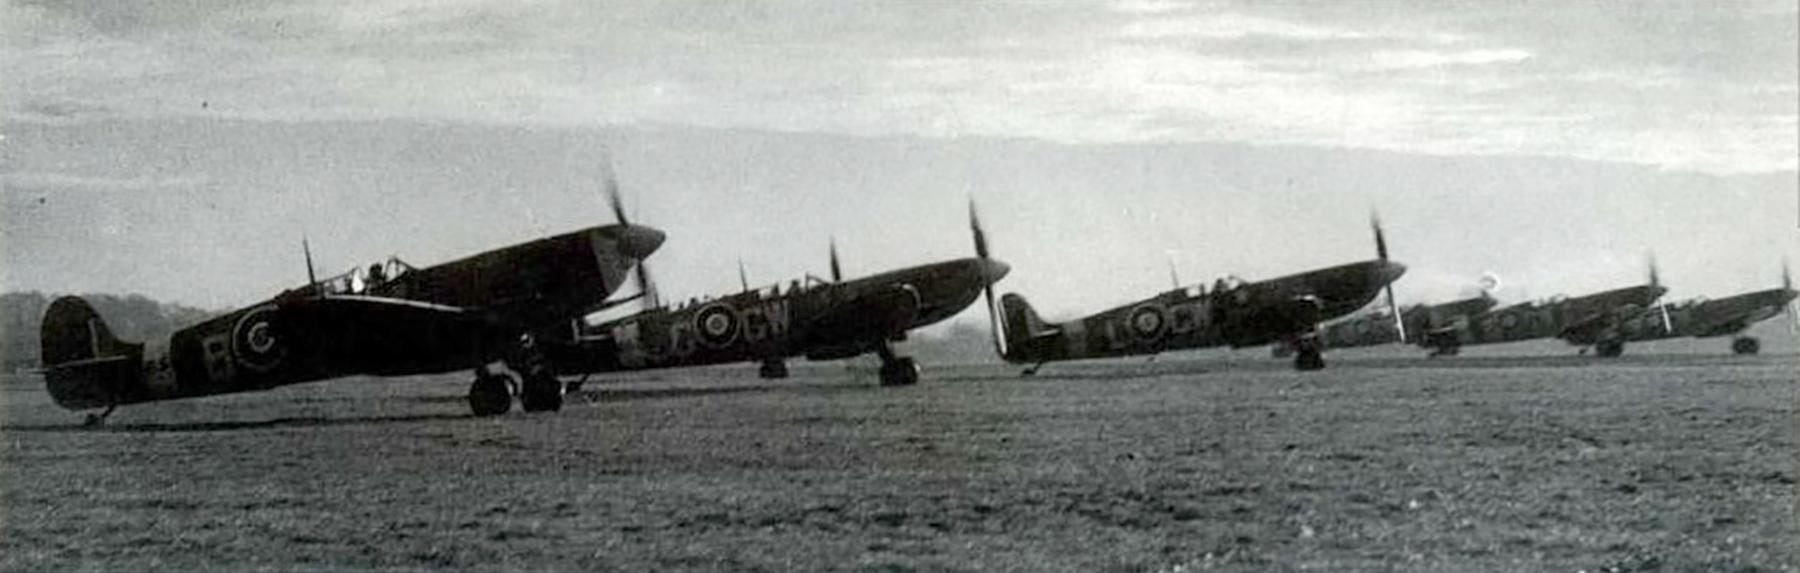 Spitfire MkIX RAF 340Sqn GWG Biggin Hill Oct 1942 01